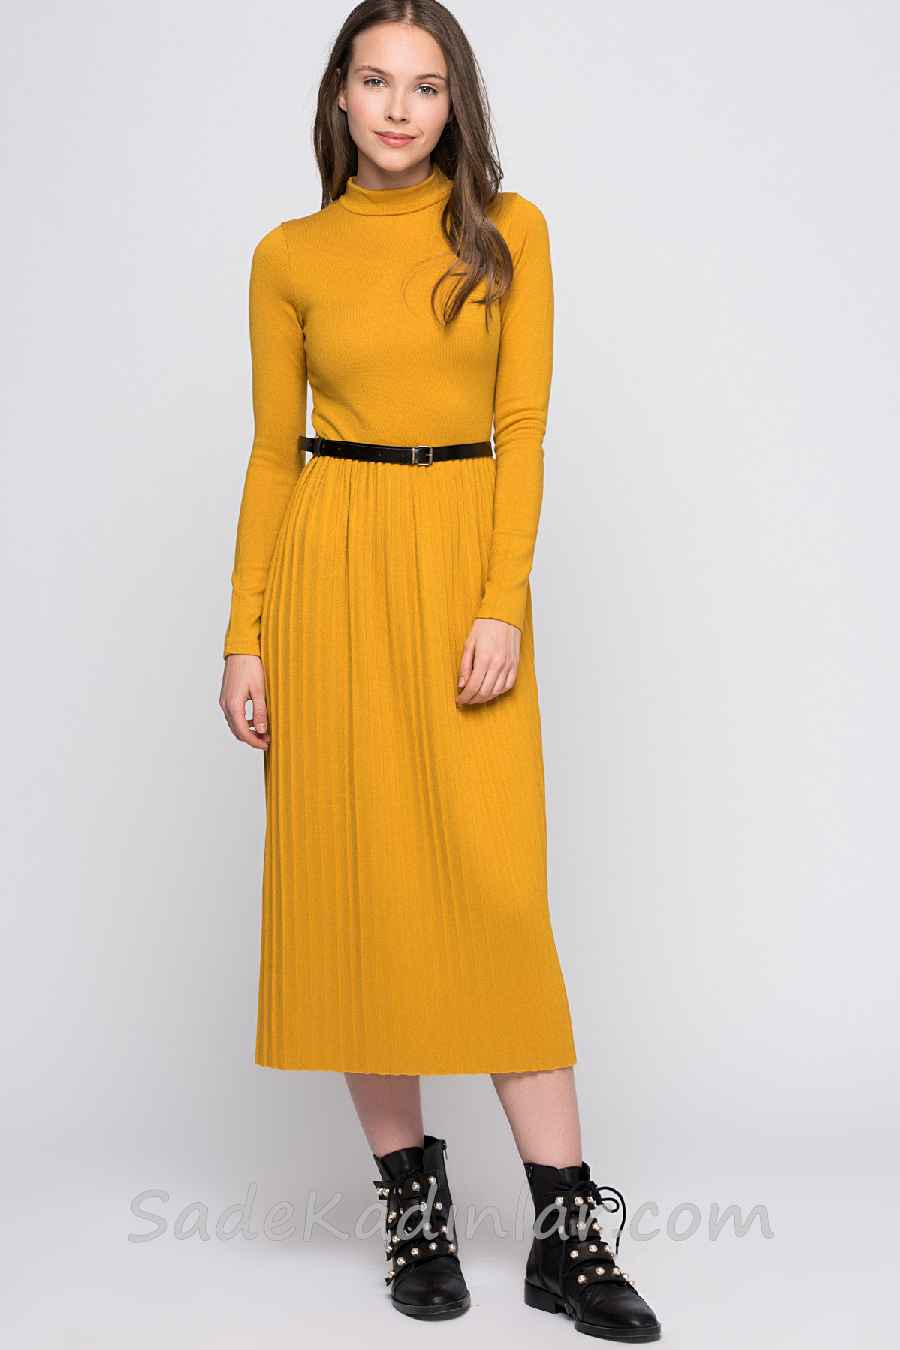 Triko elbise modelleri 2019